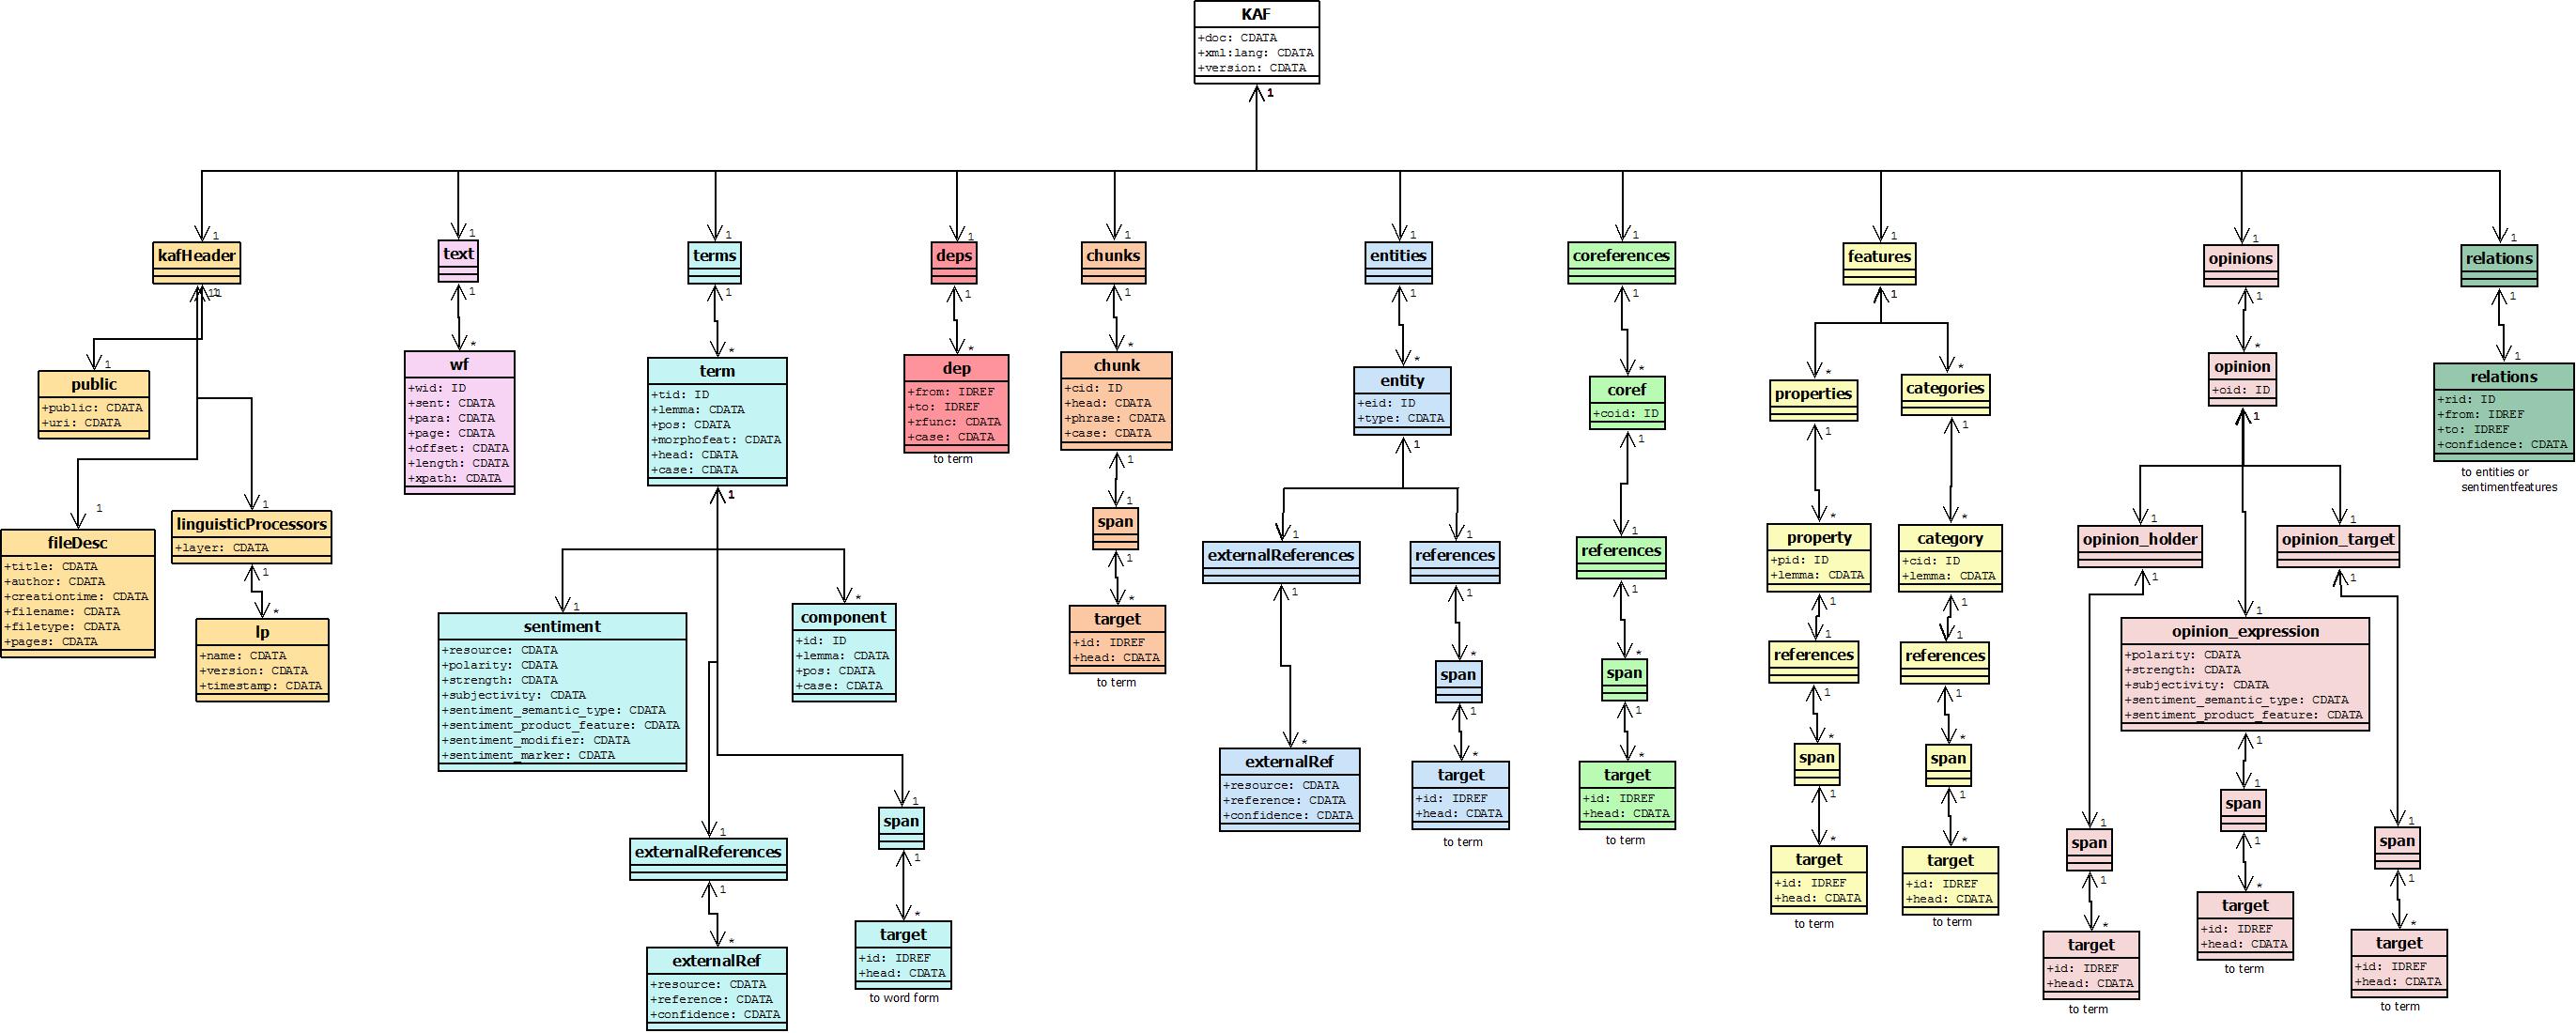 KAF diagram